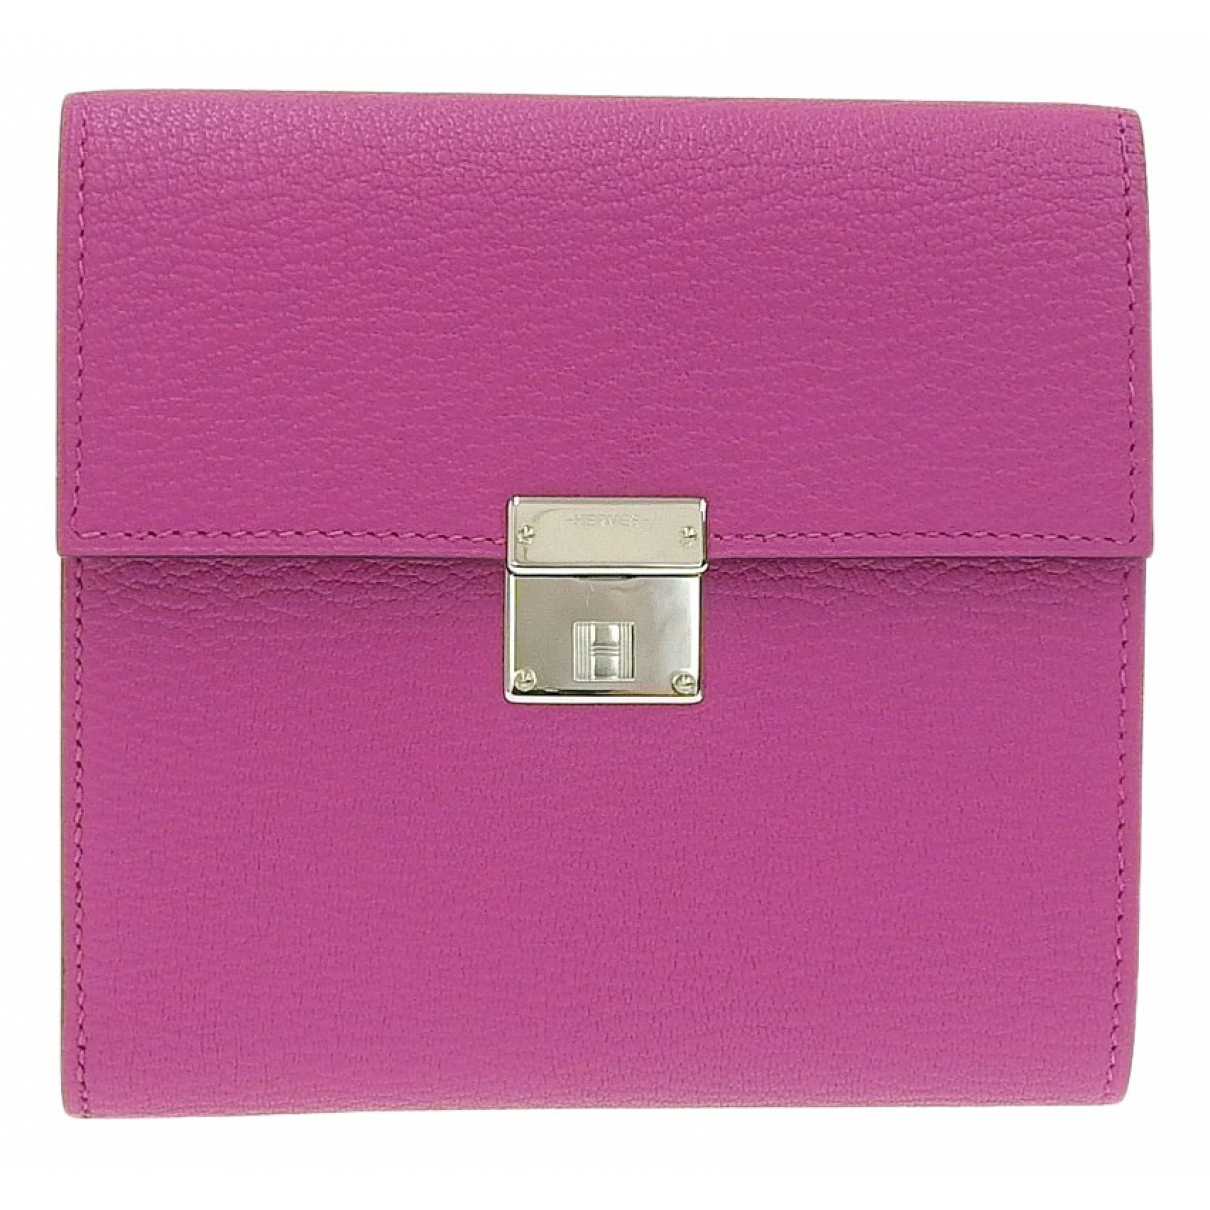 Hermès Clic 12 Black Leather wallet for Women N